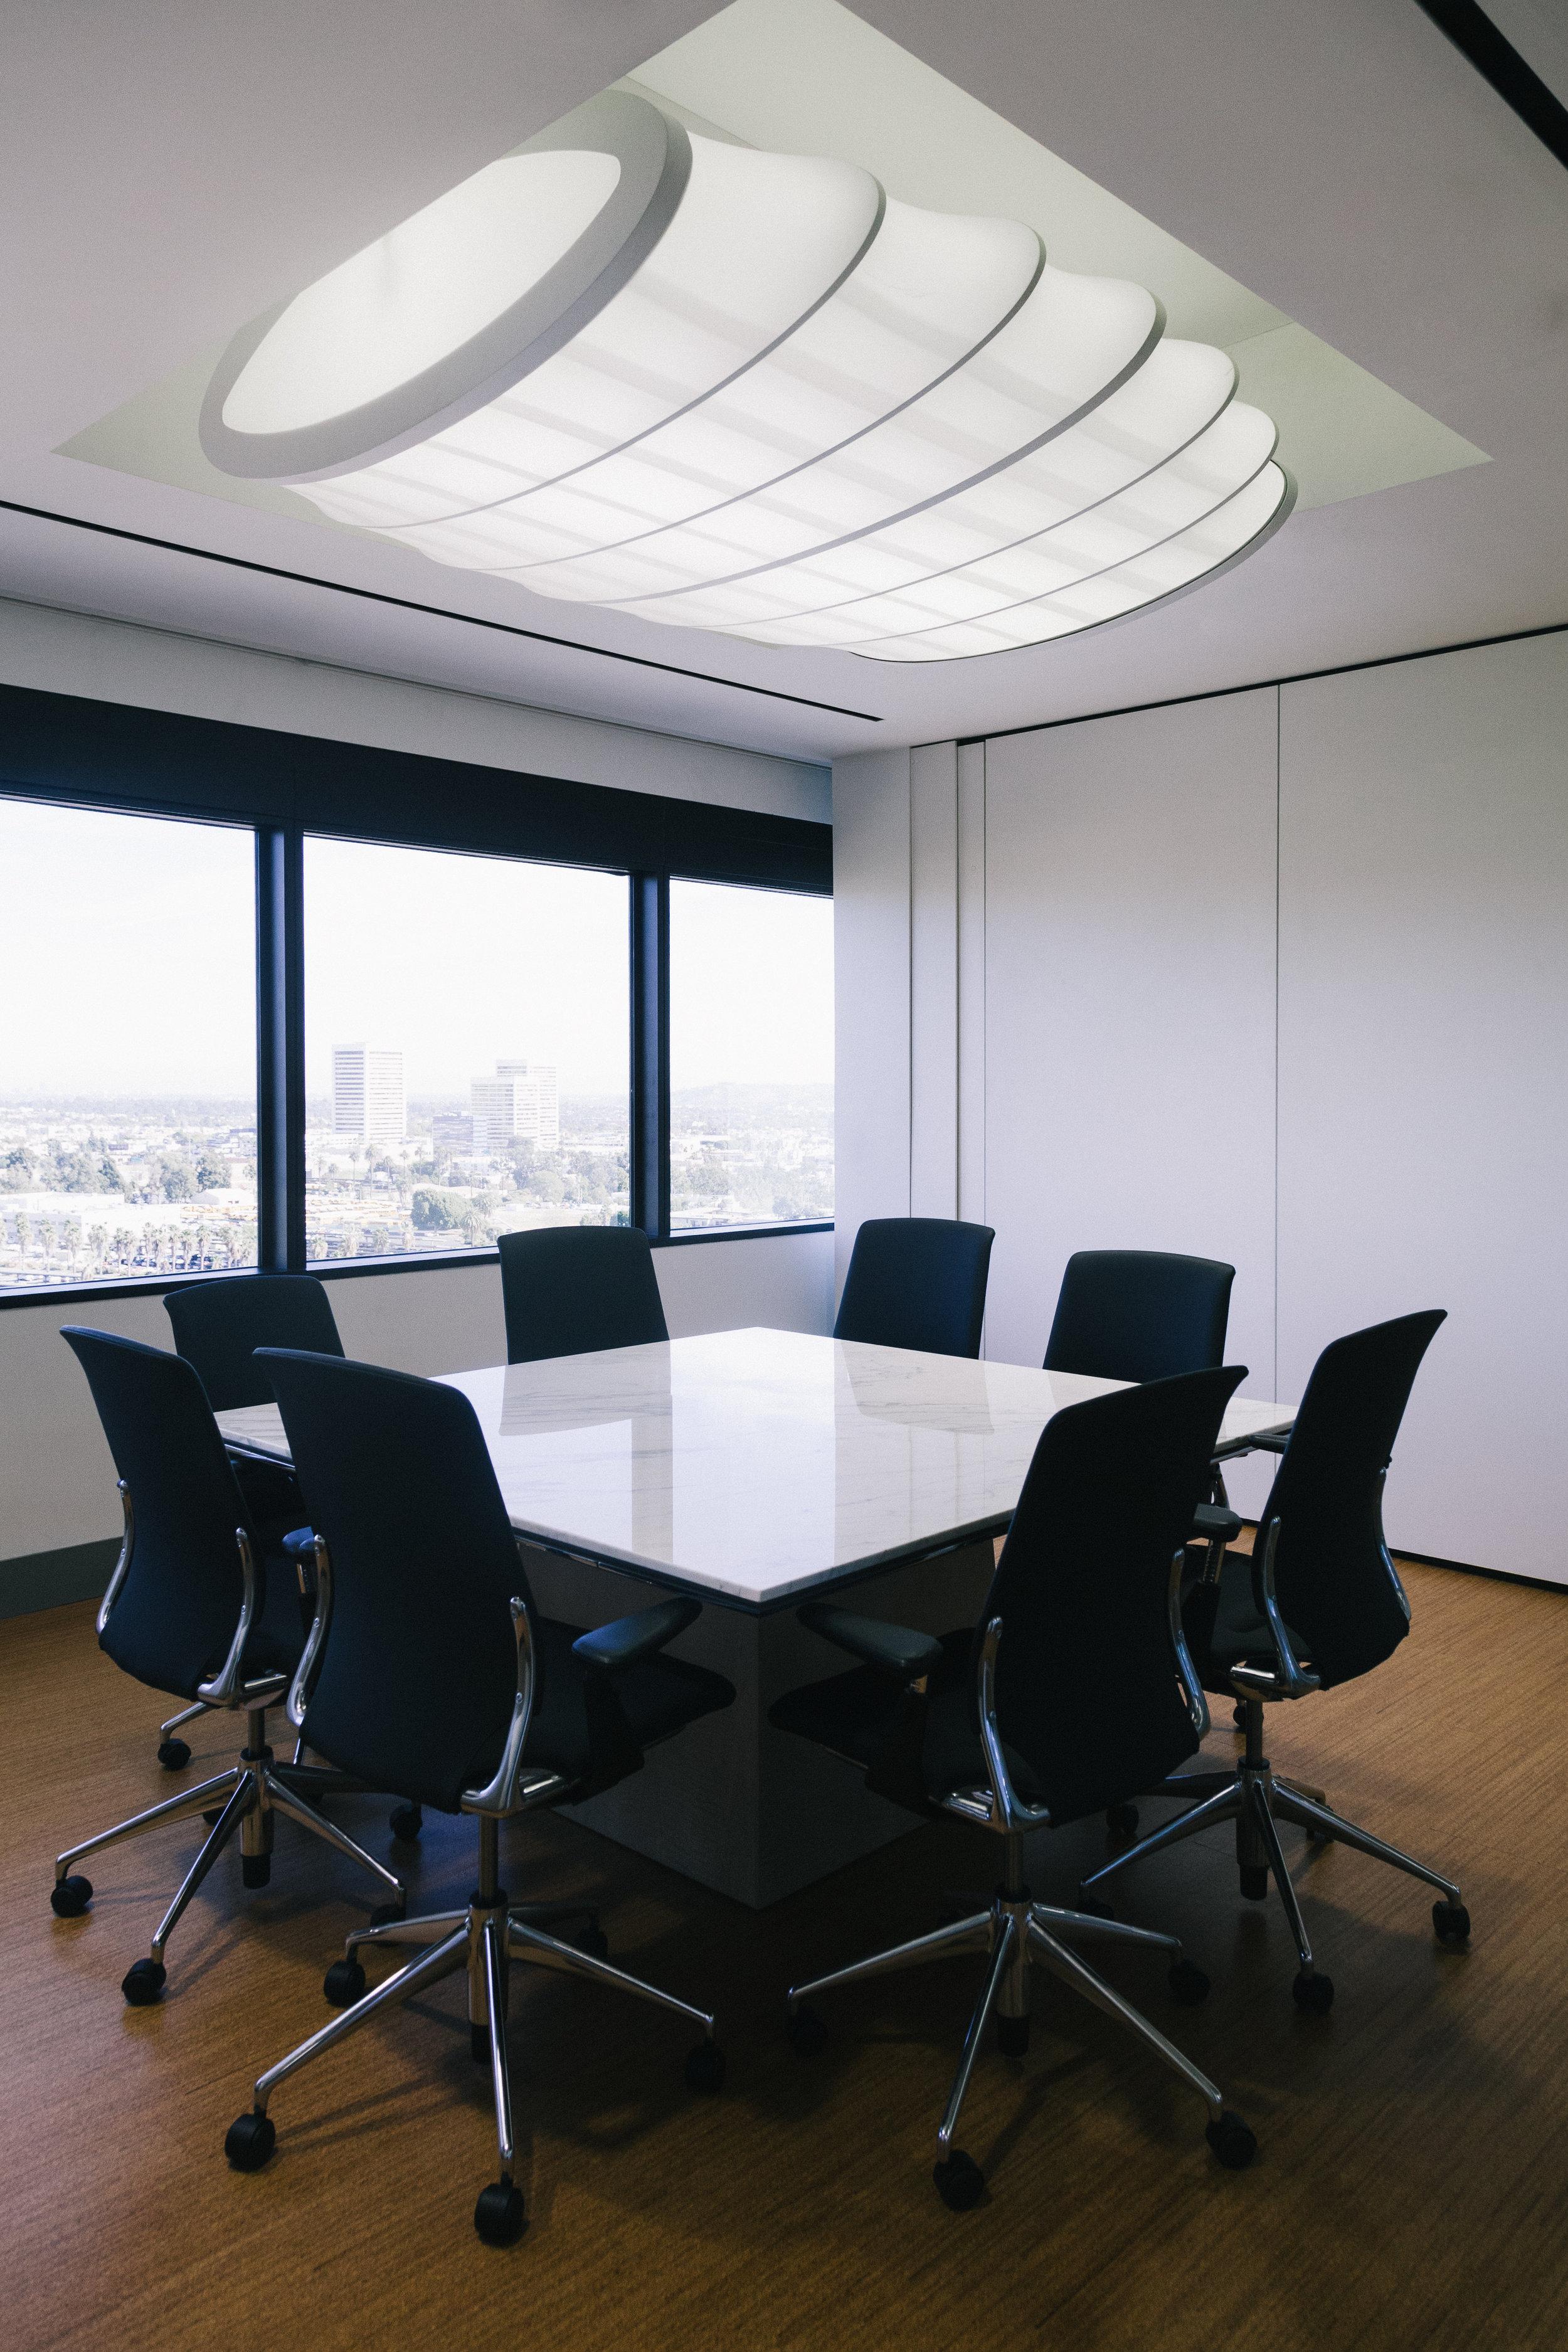 S.E.A.-Studio-Environmental-Architecture-David-Hertz-FAIA-First-Pacific-Advisors-Los-Angeles-tenant-improvement-sustainable-regenerative-restorative-green-design-office-sleek-modern-interior-Westside-commercial-building-professional-workplace-11.jpg